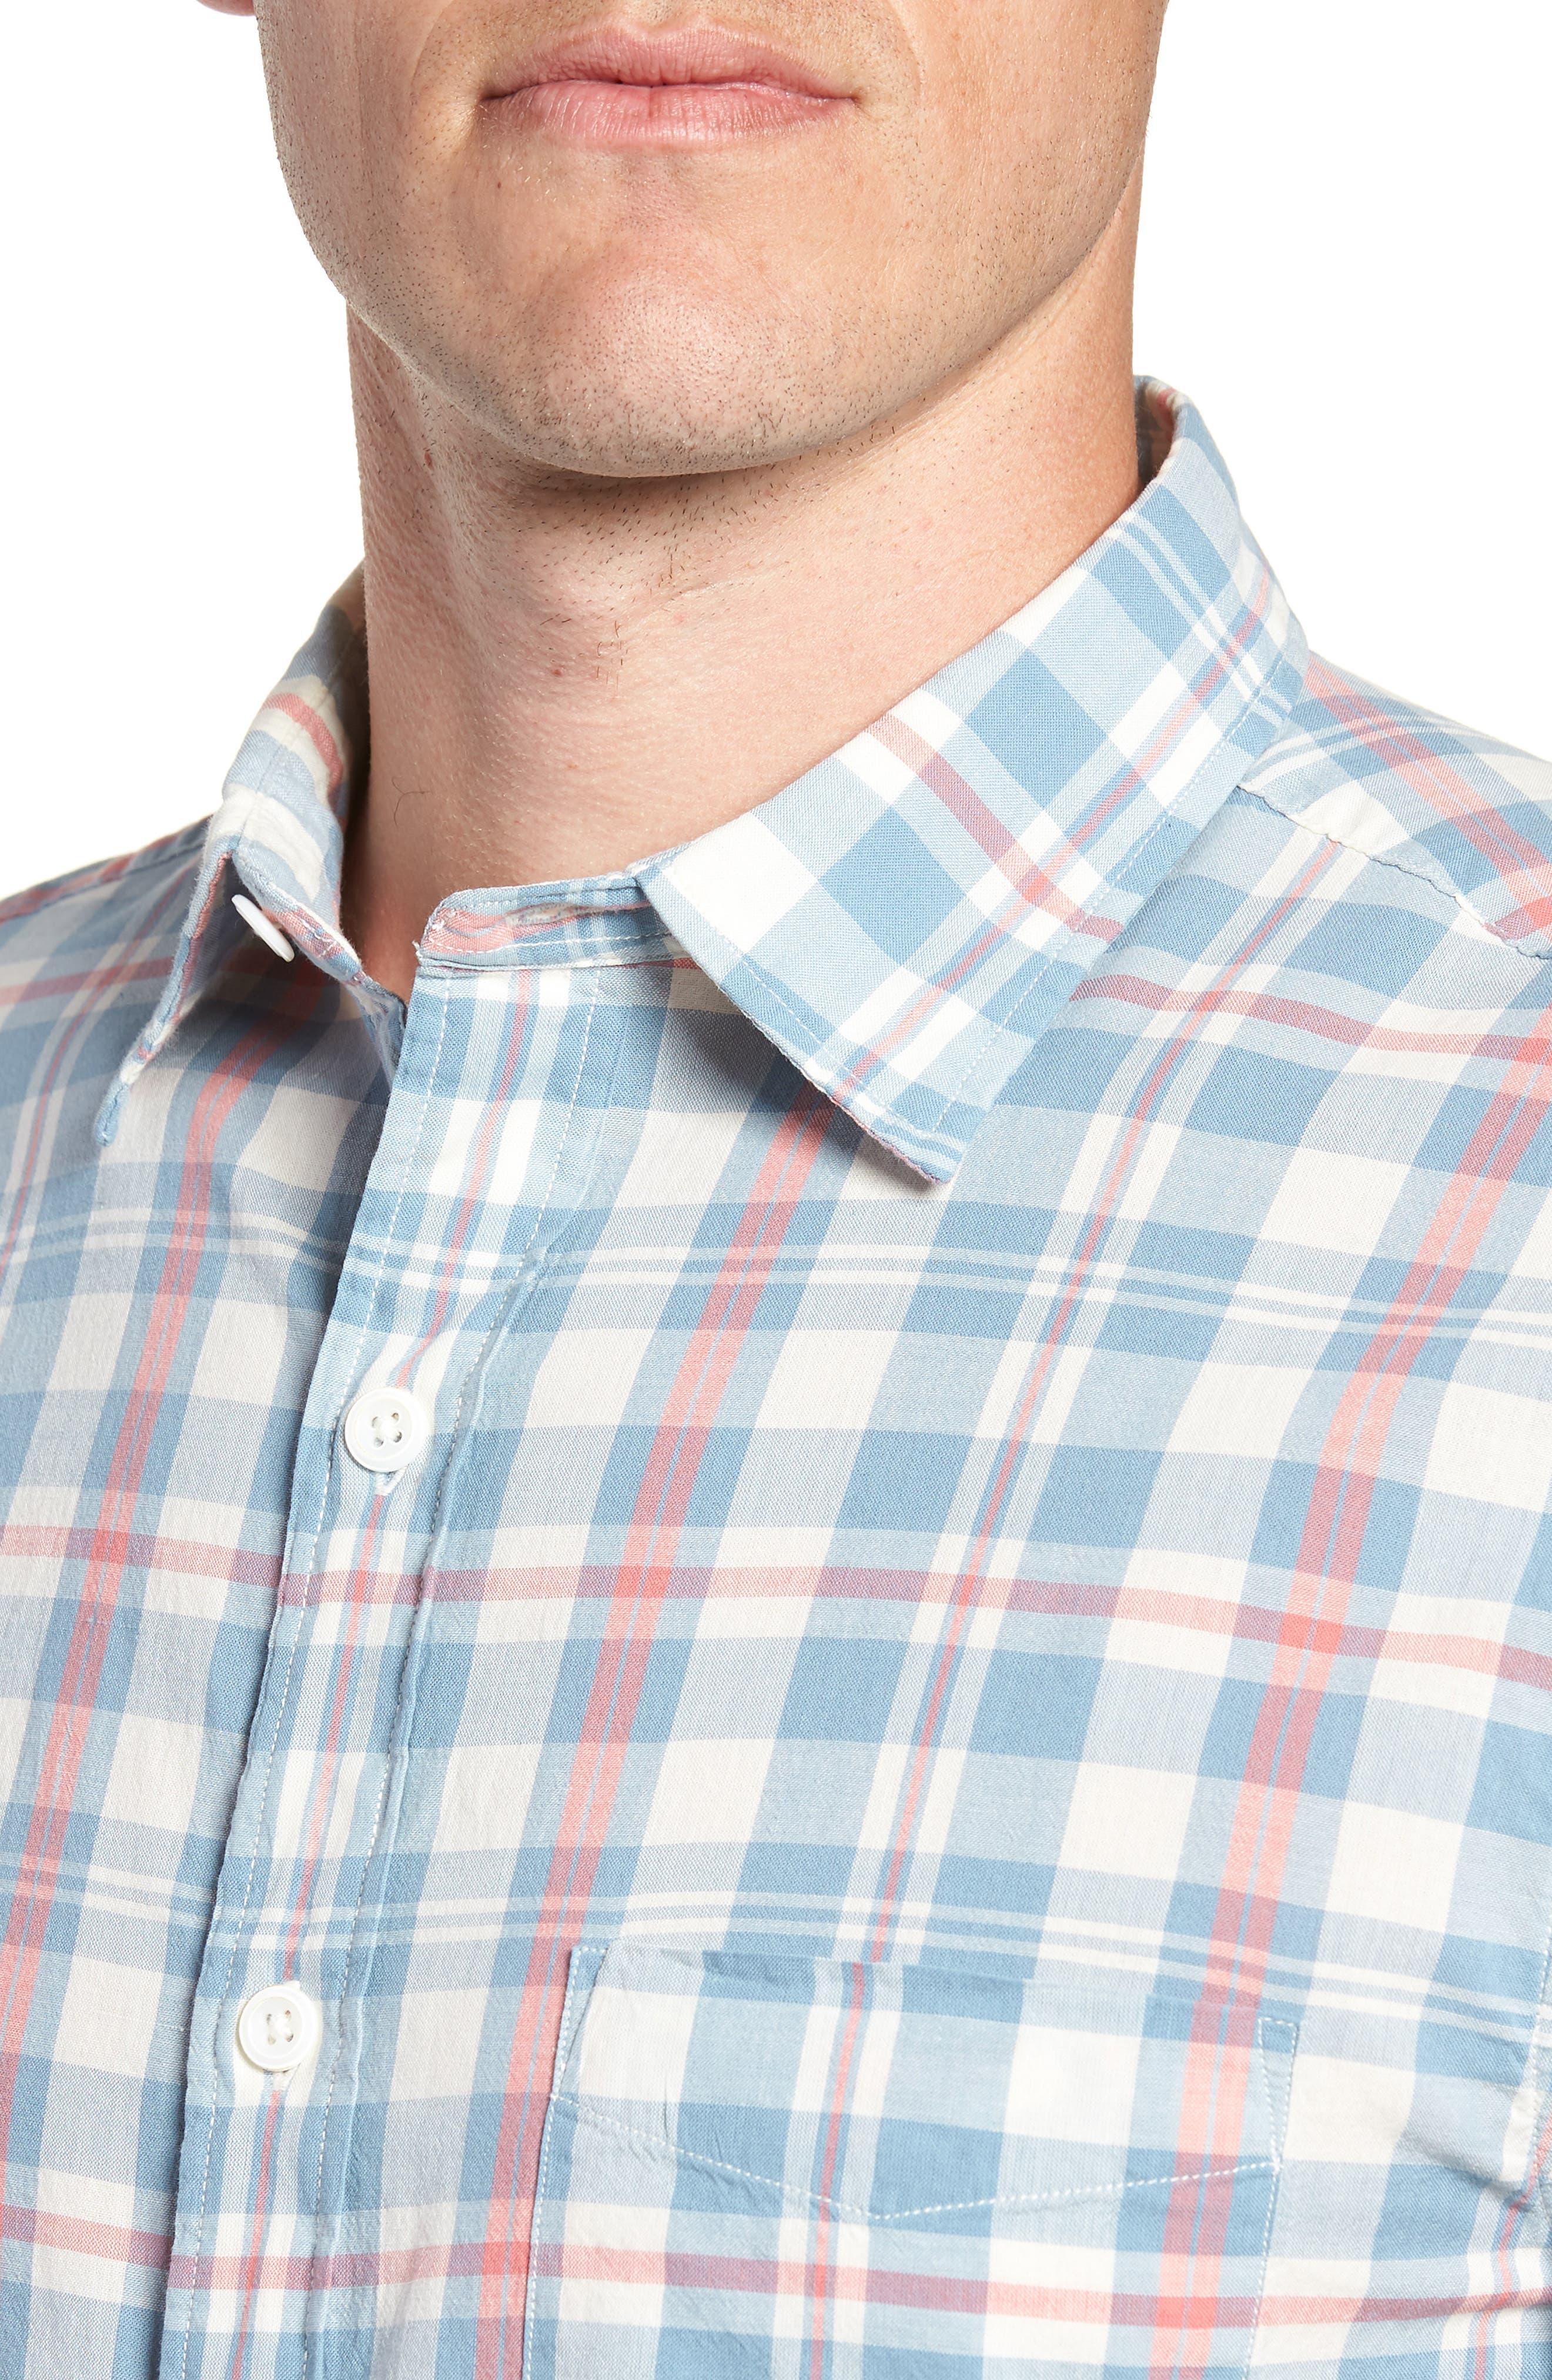 Ventura Plaid Sport Shirt,                             Alternate thumbnail 4, color,                             WASHED BLUE CREAM